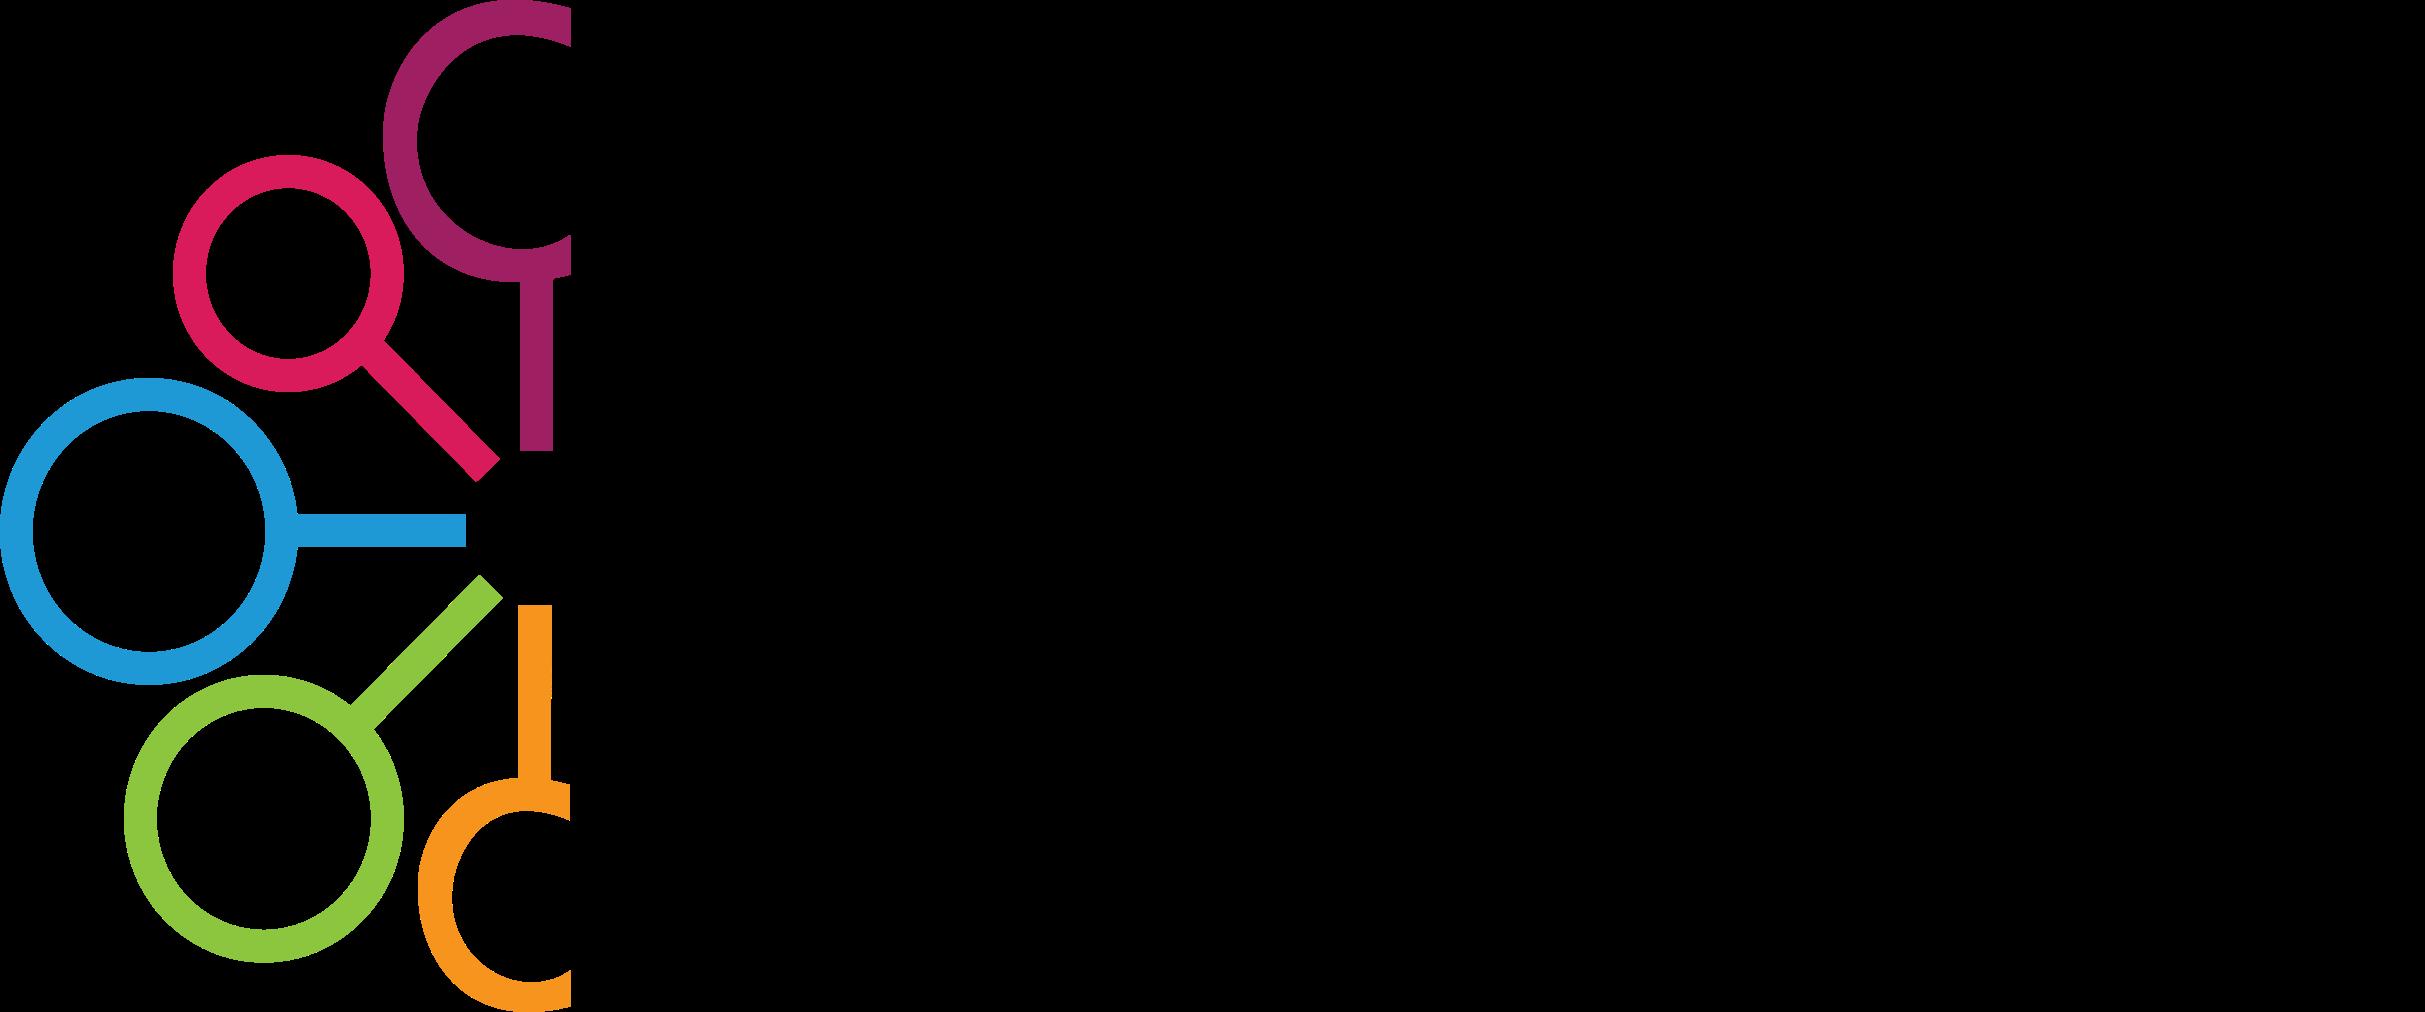 2019 02 logo MLRNOR NN.png